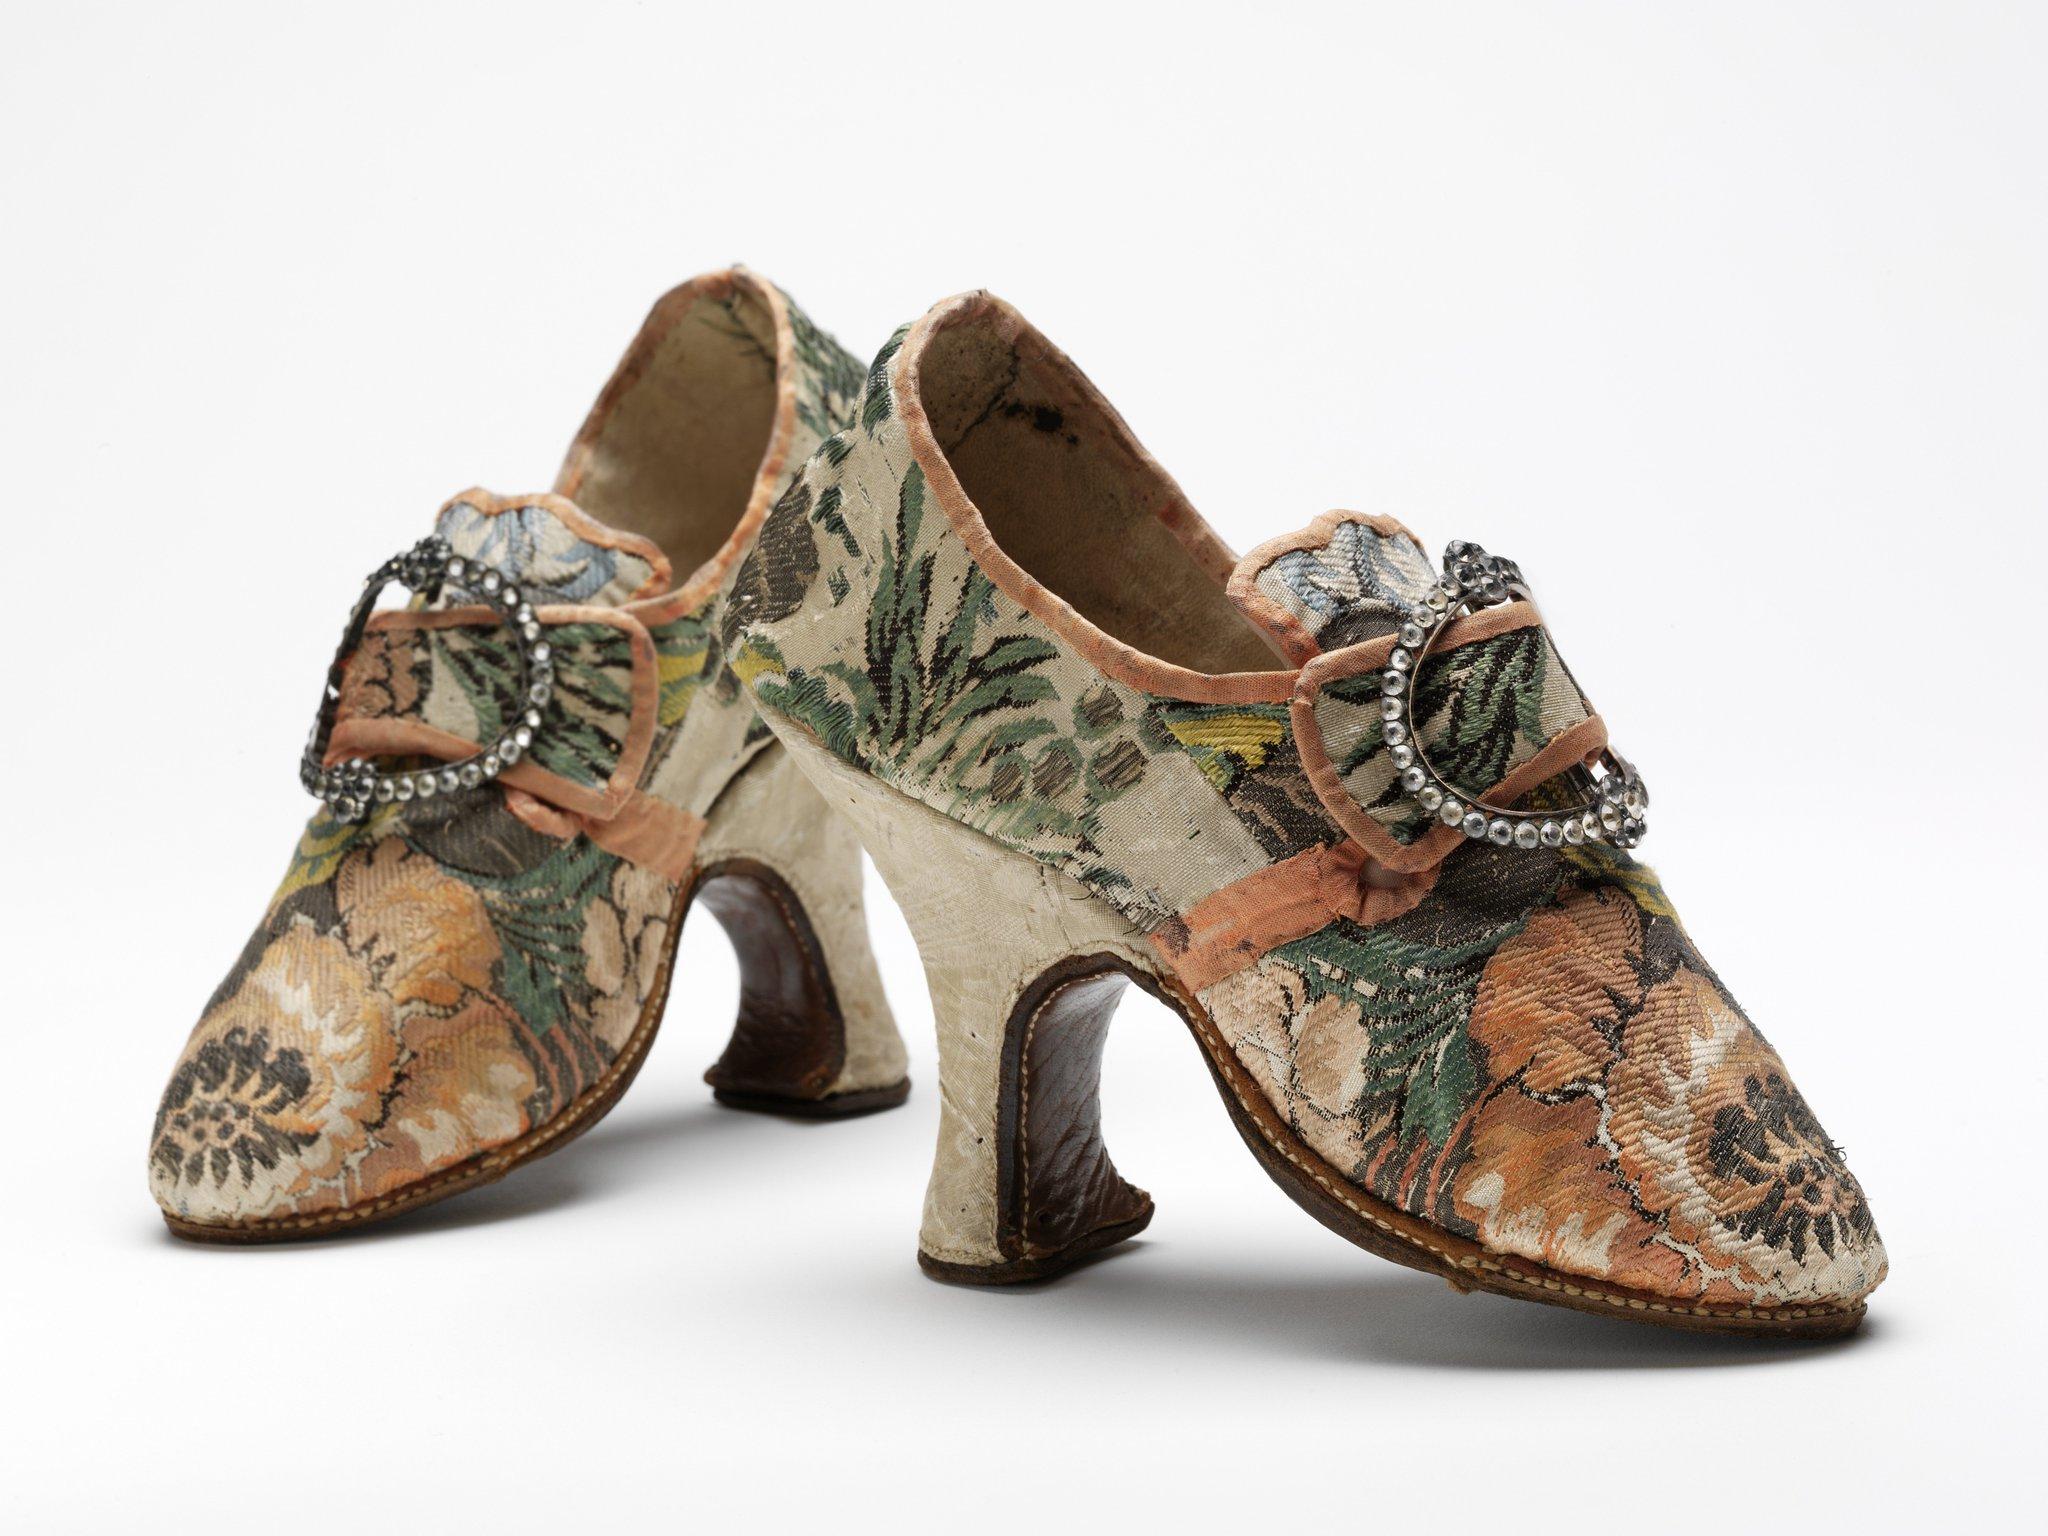 12 Days of #vamShoes: 'Pompadour' shoes, France 1750s popularised by Madame de Pompadour born #onthisday 1721. https://t.co/9AFlRZgCEZ